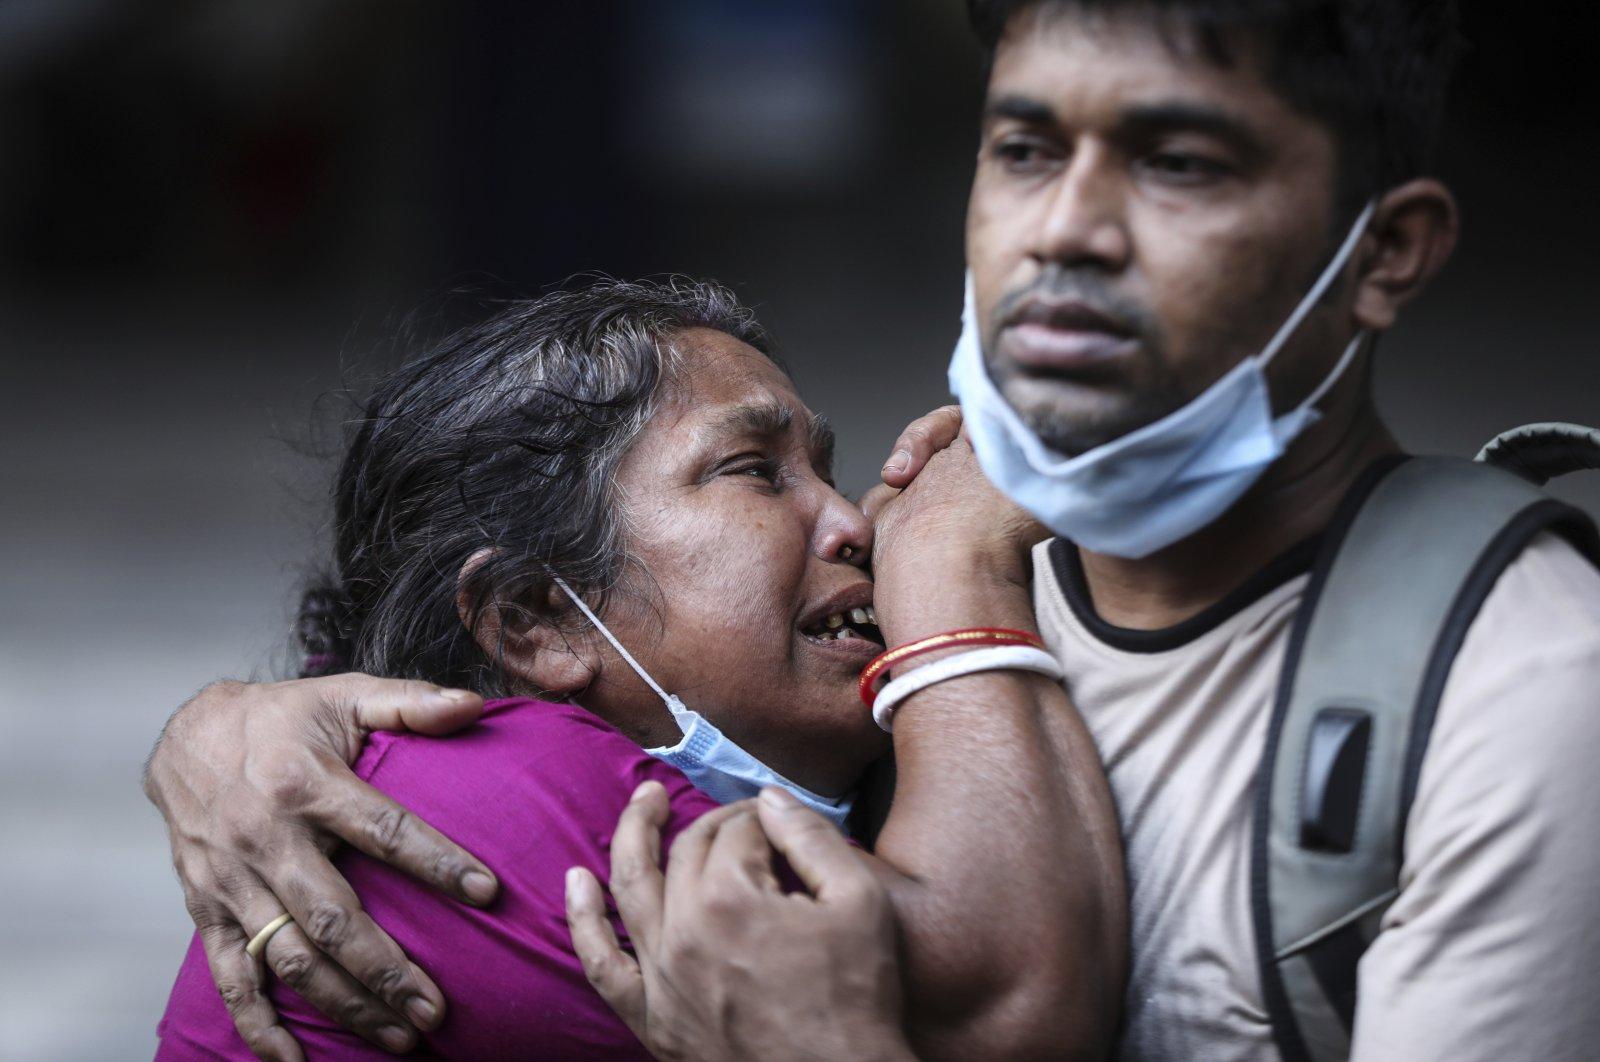 A Bangladeshi woman mourns the death of her husband who died of COVID-19 at a hospital in Dhaka, Bangladesh, May 7, 2021. (Mahmud Hossain Opu via AP)